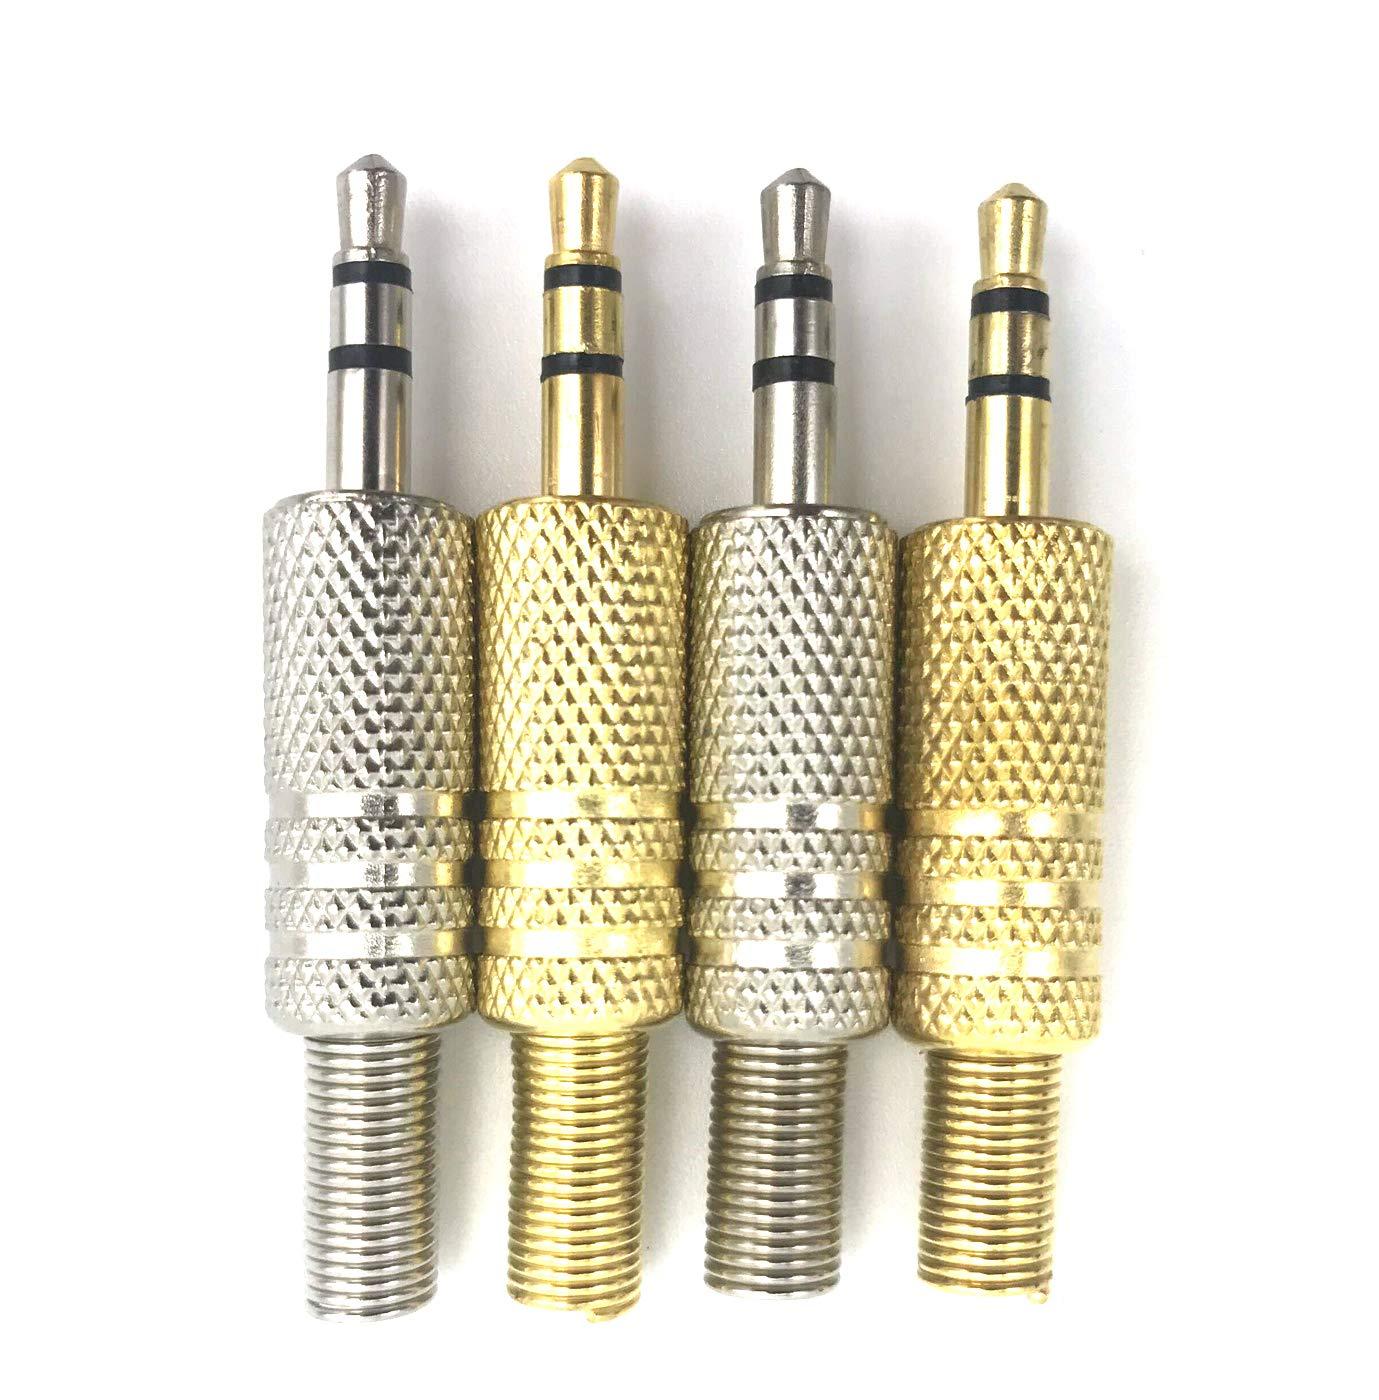 Vimmor 4/pezzi 3/palo di ricambio per cuffie audio jack maschio spina saldatura connettore per audio e video saldatura fine